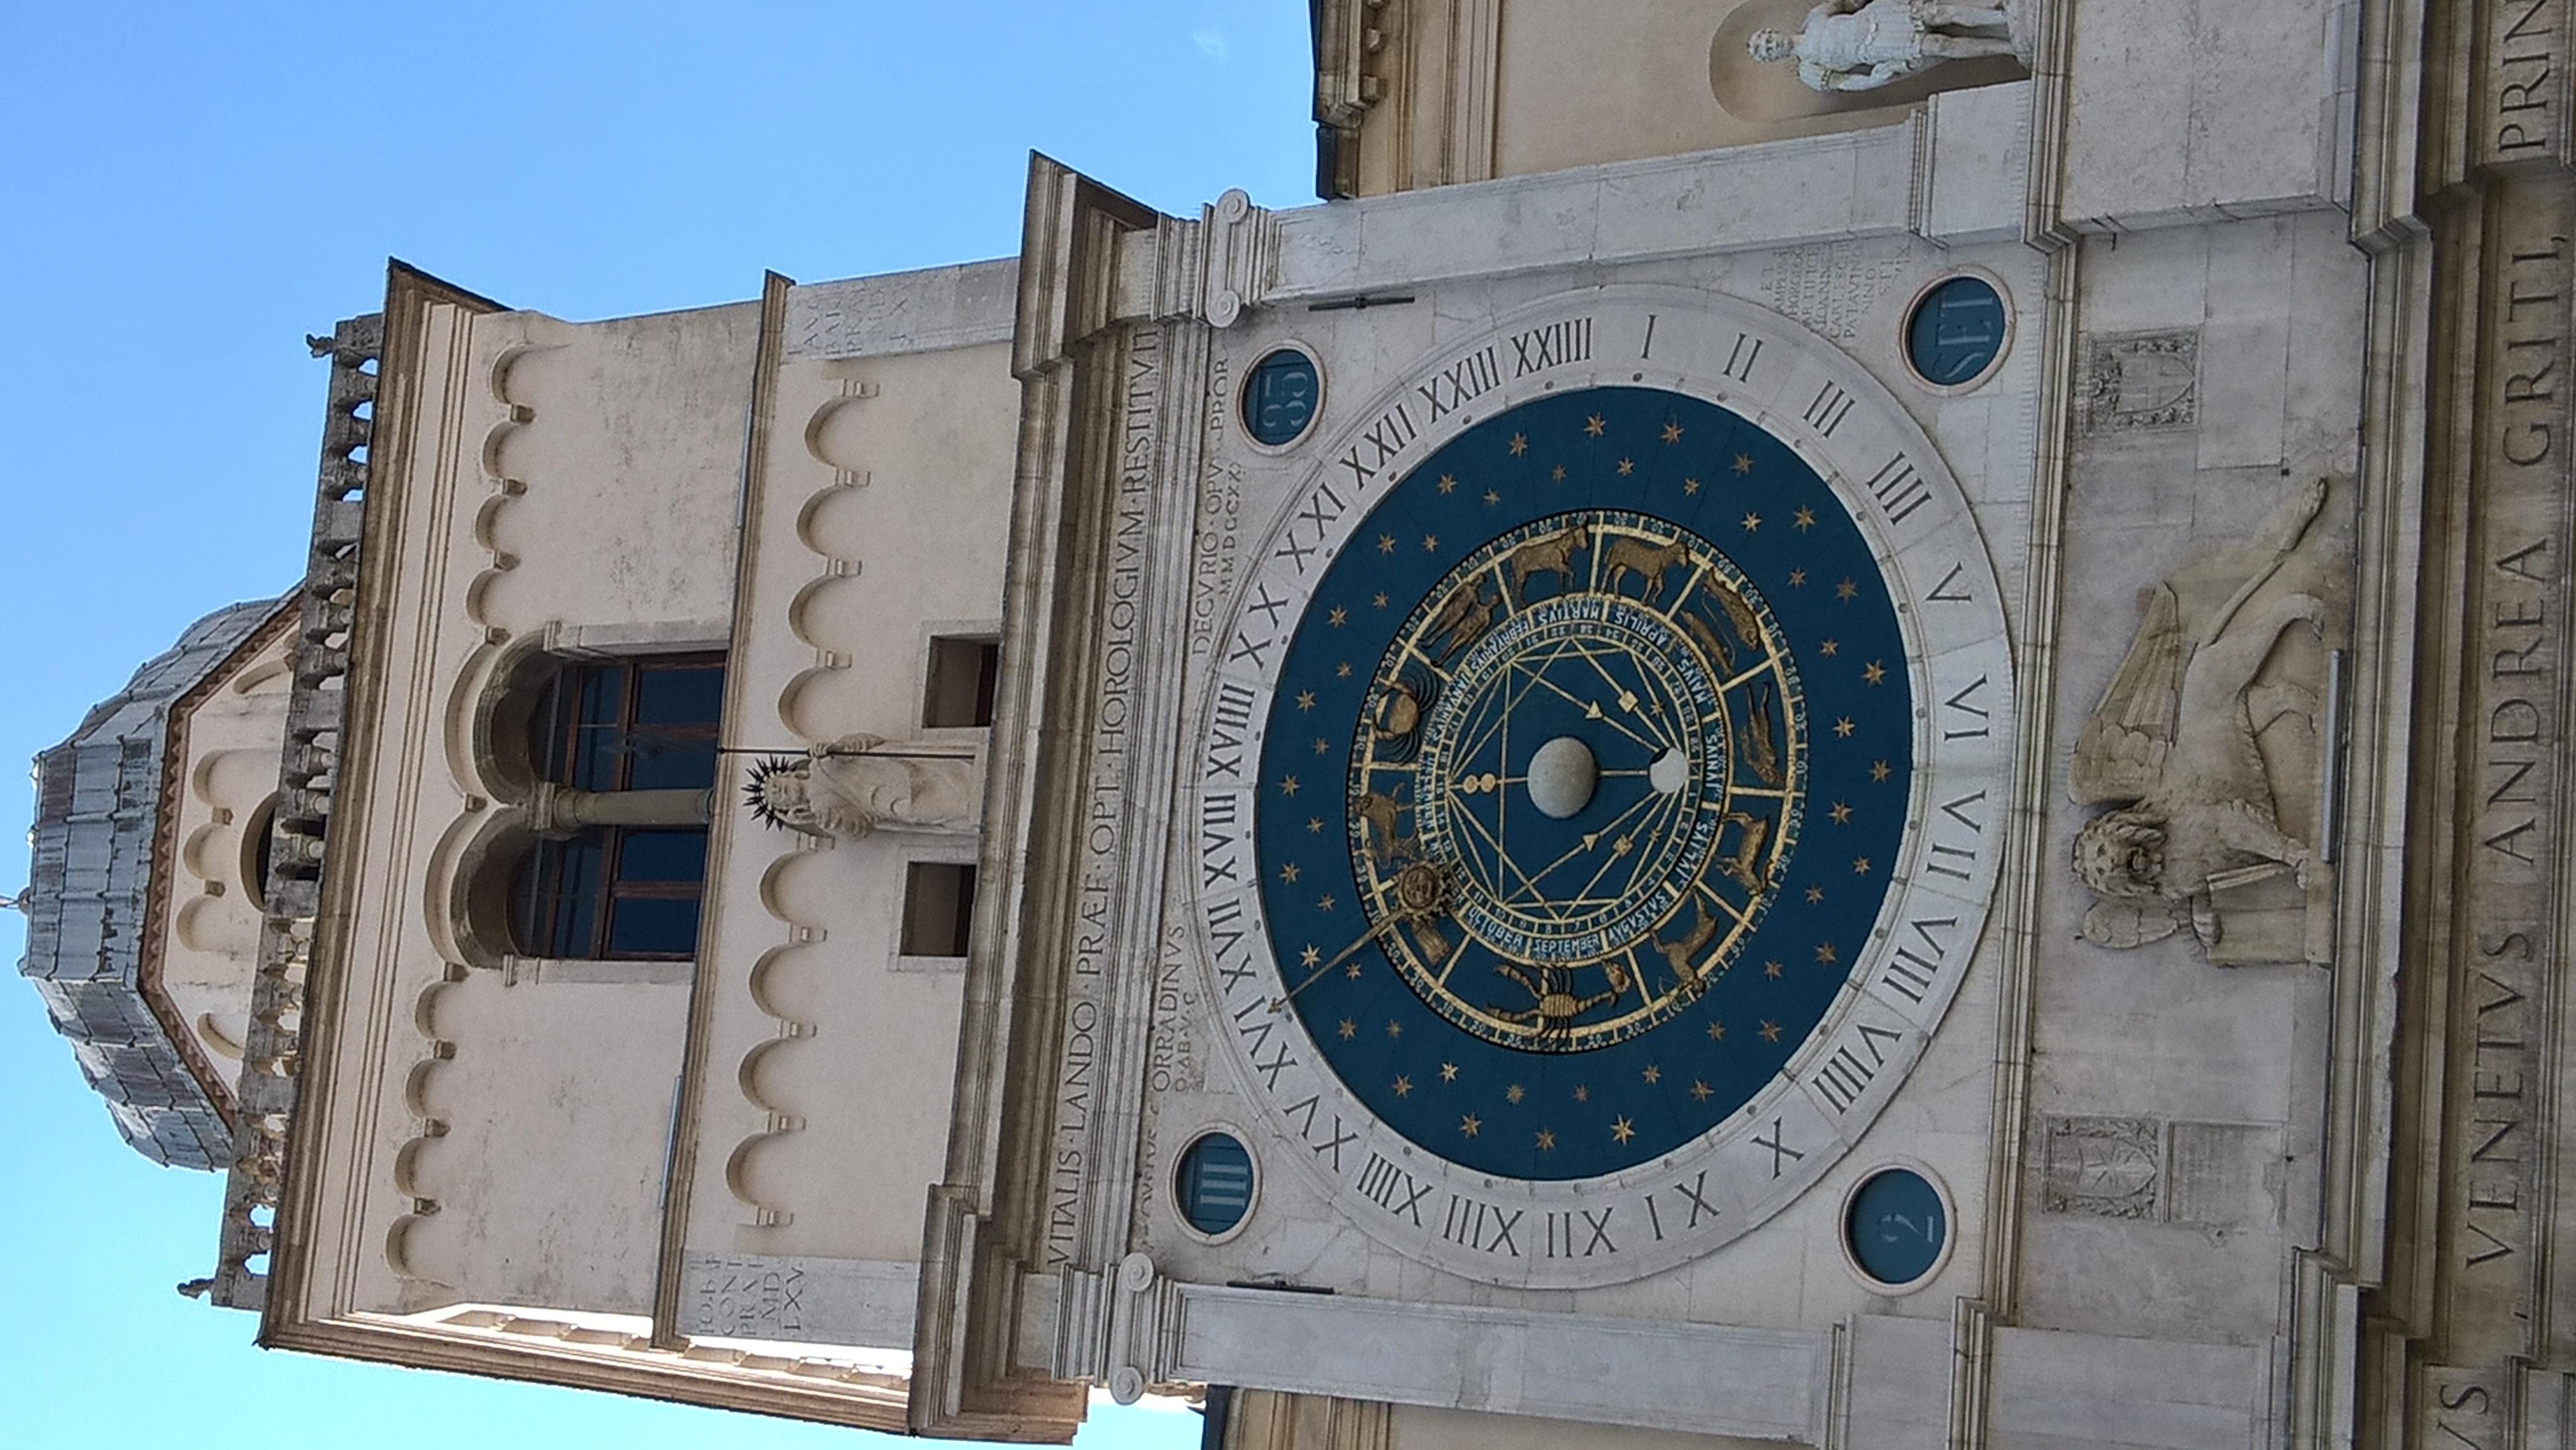 Zodiacal clock, Padova